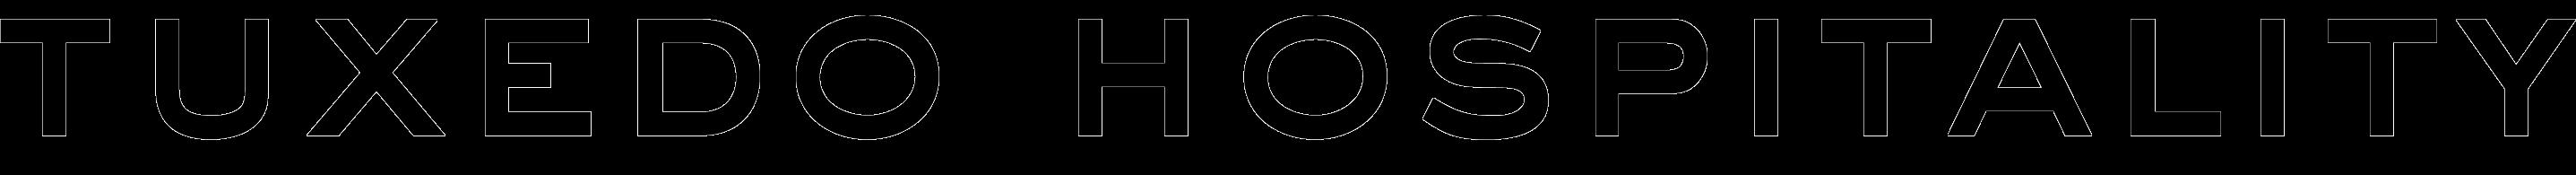 shape, circle